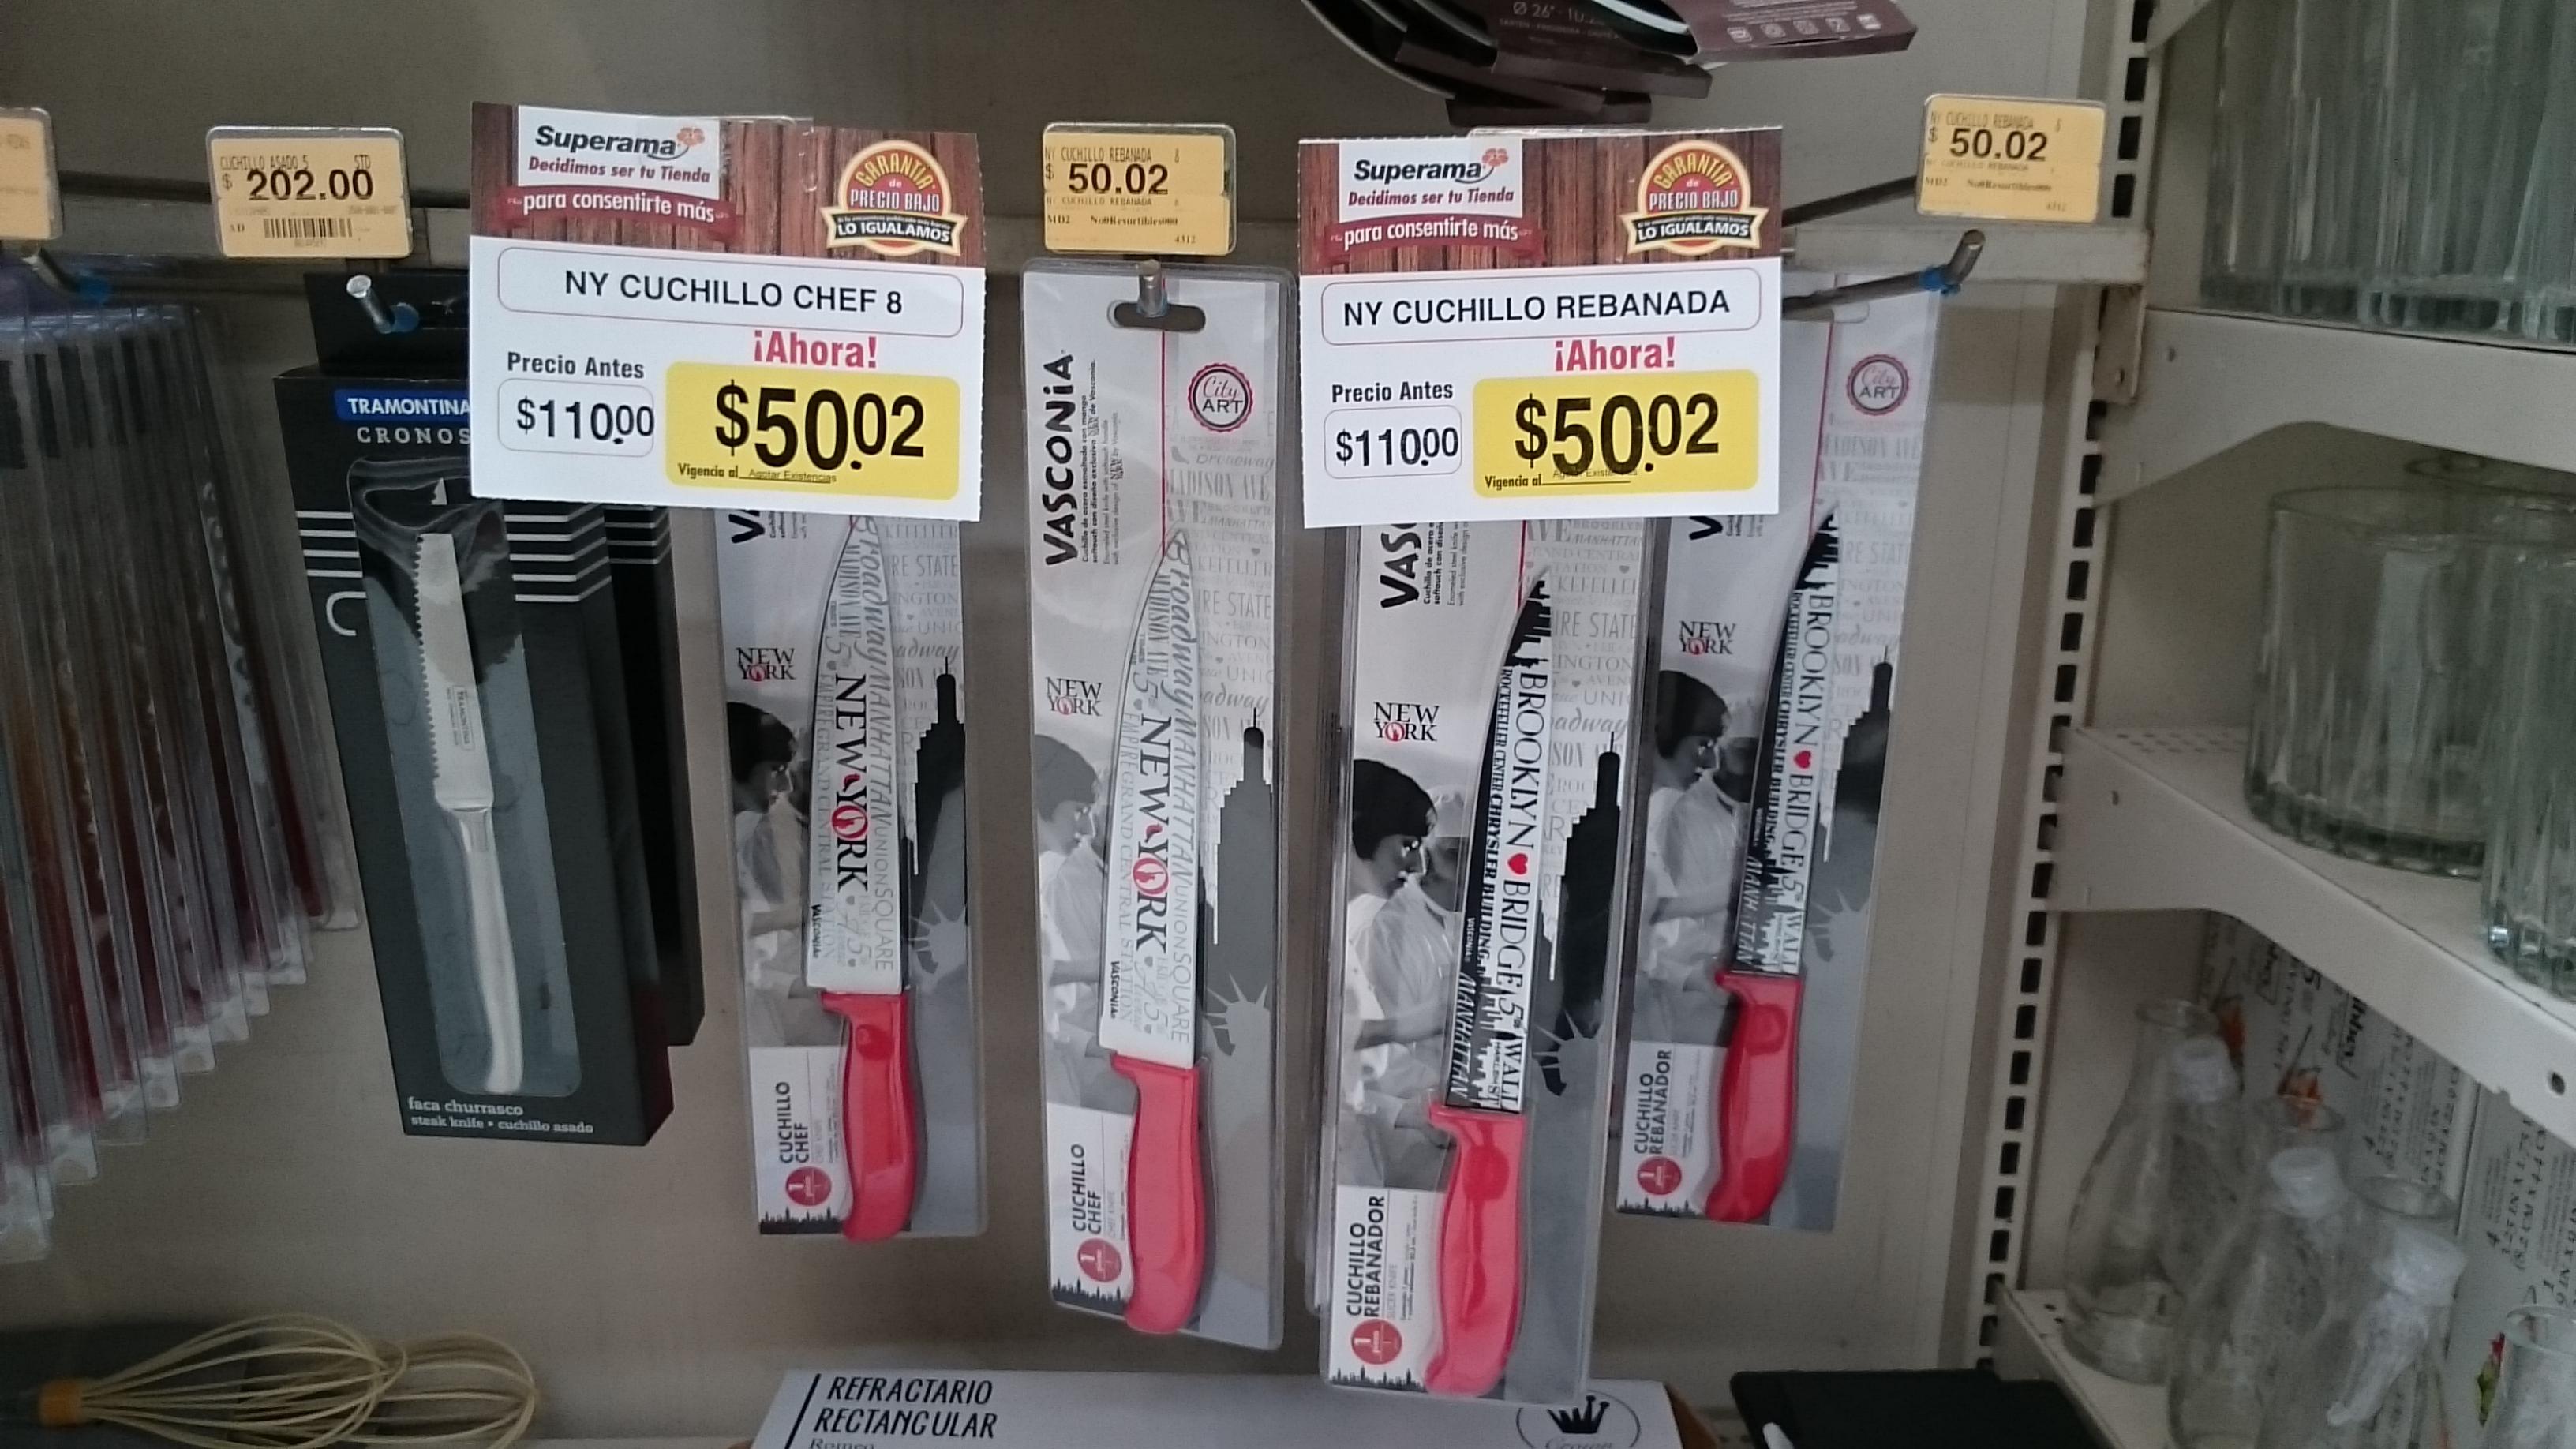 Superama Rio Mayo: cuchillo NY de $110 a $50.02